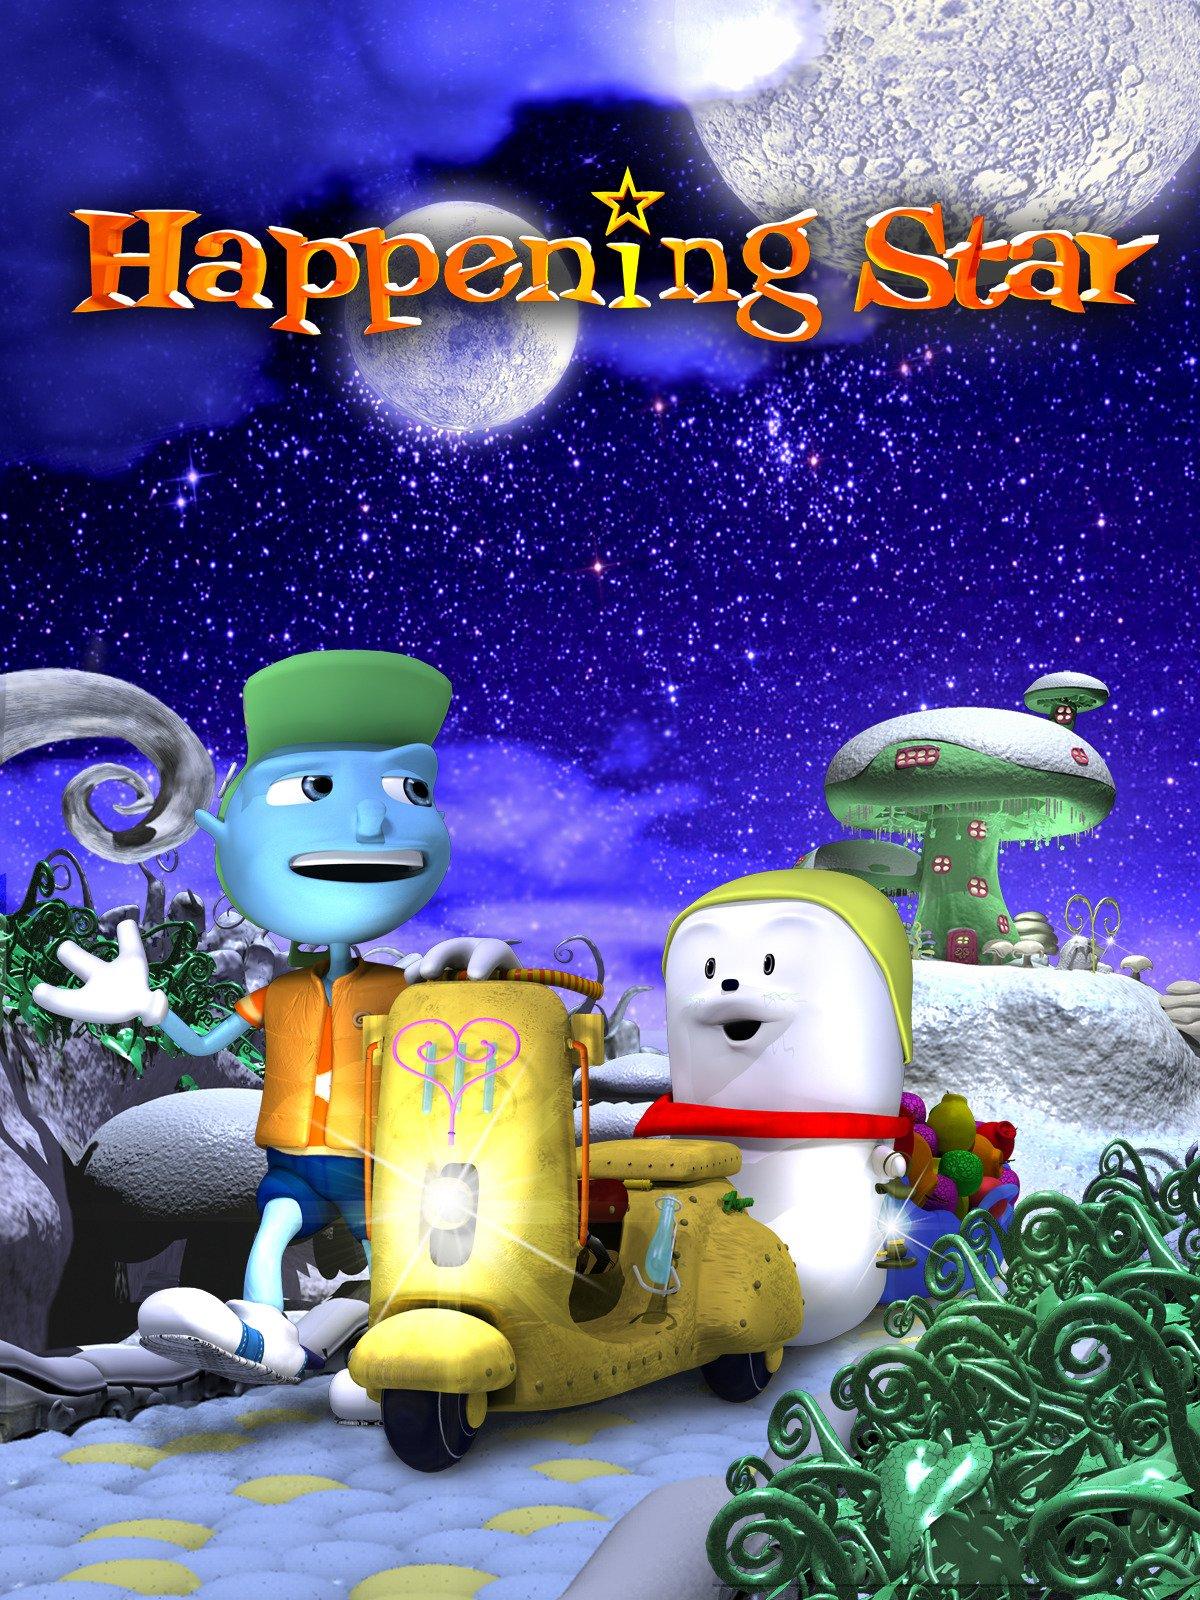 Happening Star